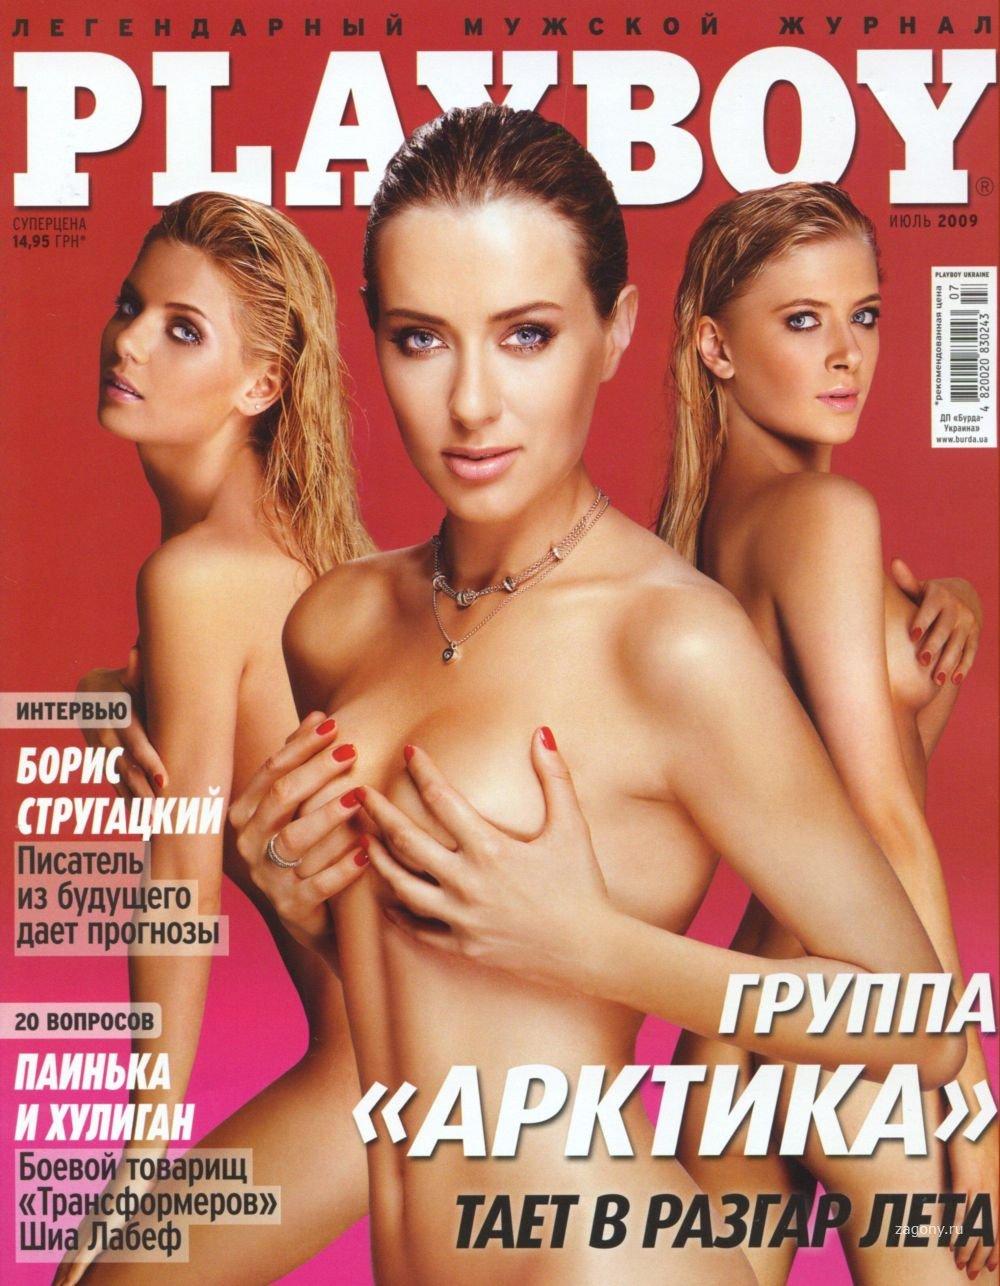 krasivoe-gruppovoe-porno-russkih-studentov